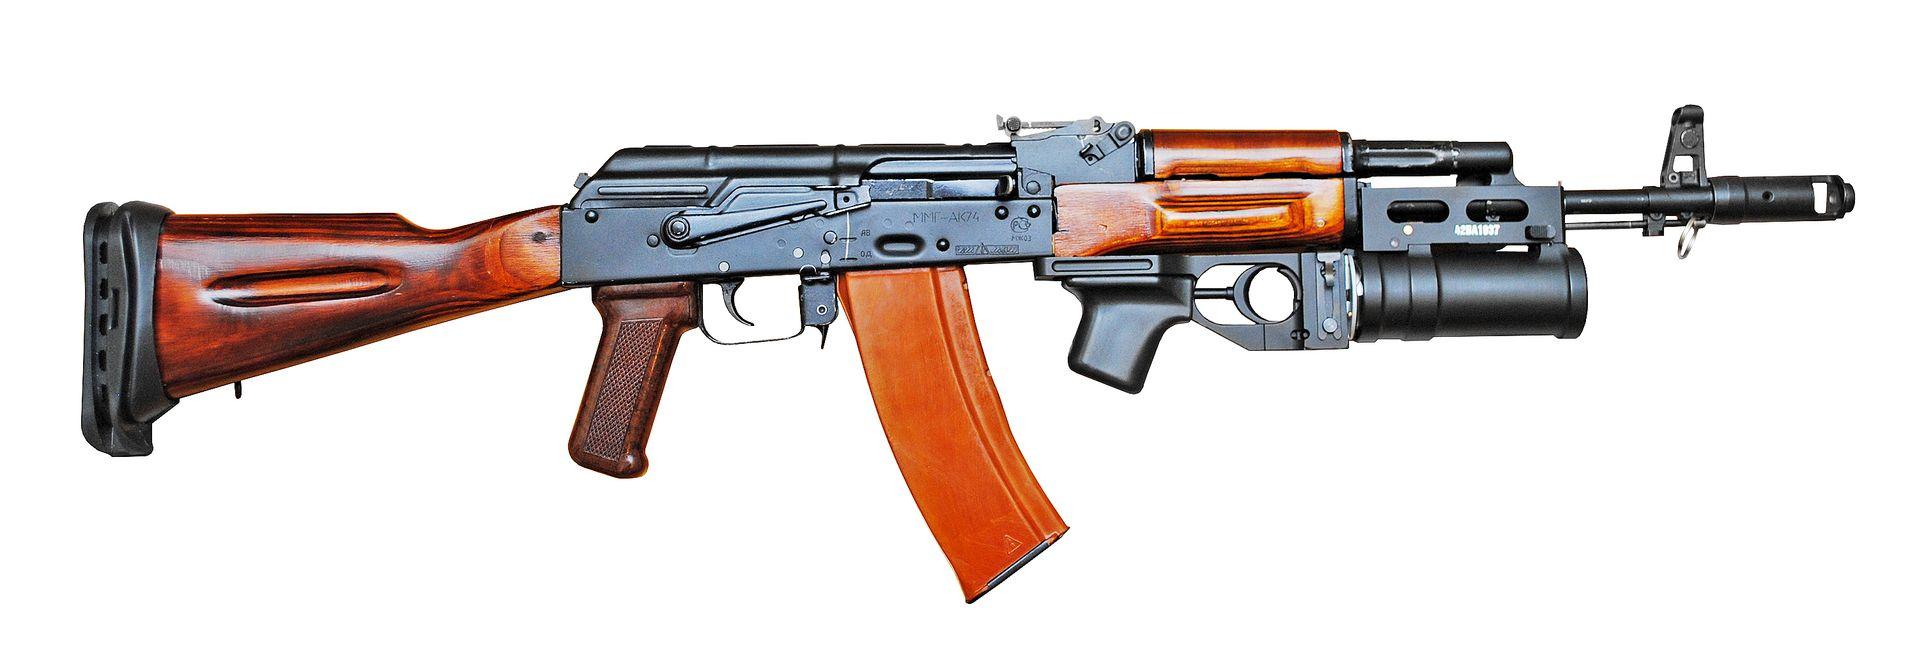 Ak74/GP-25 KASTYOR | Rifles | M16 rifle, Guns, Weapons